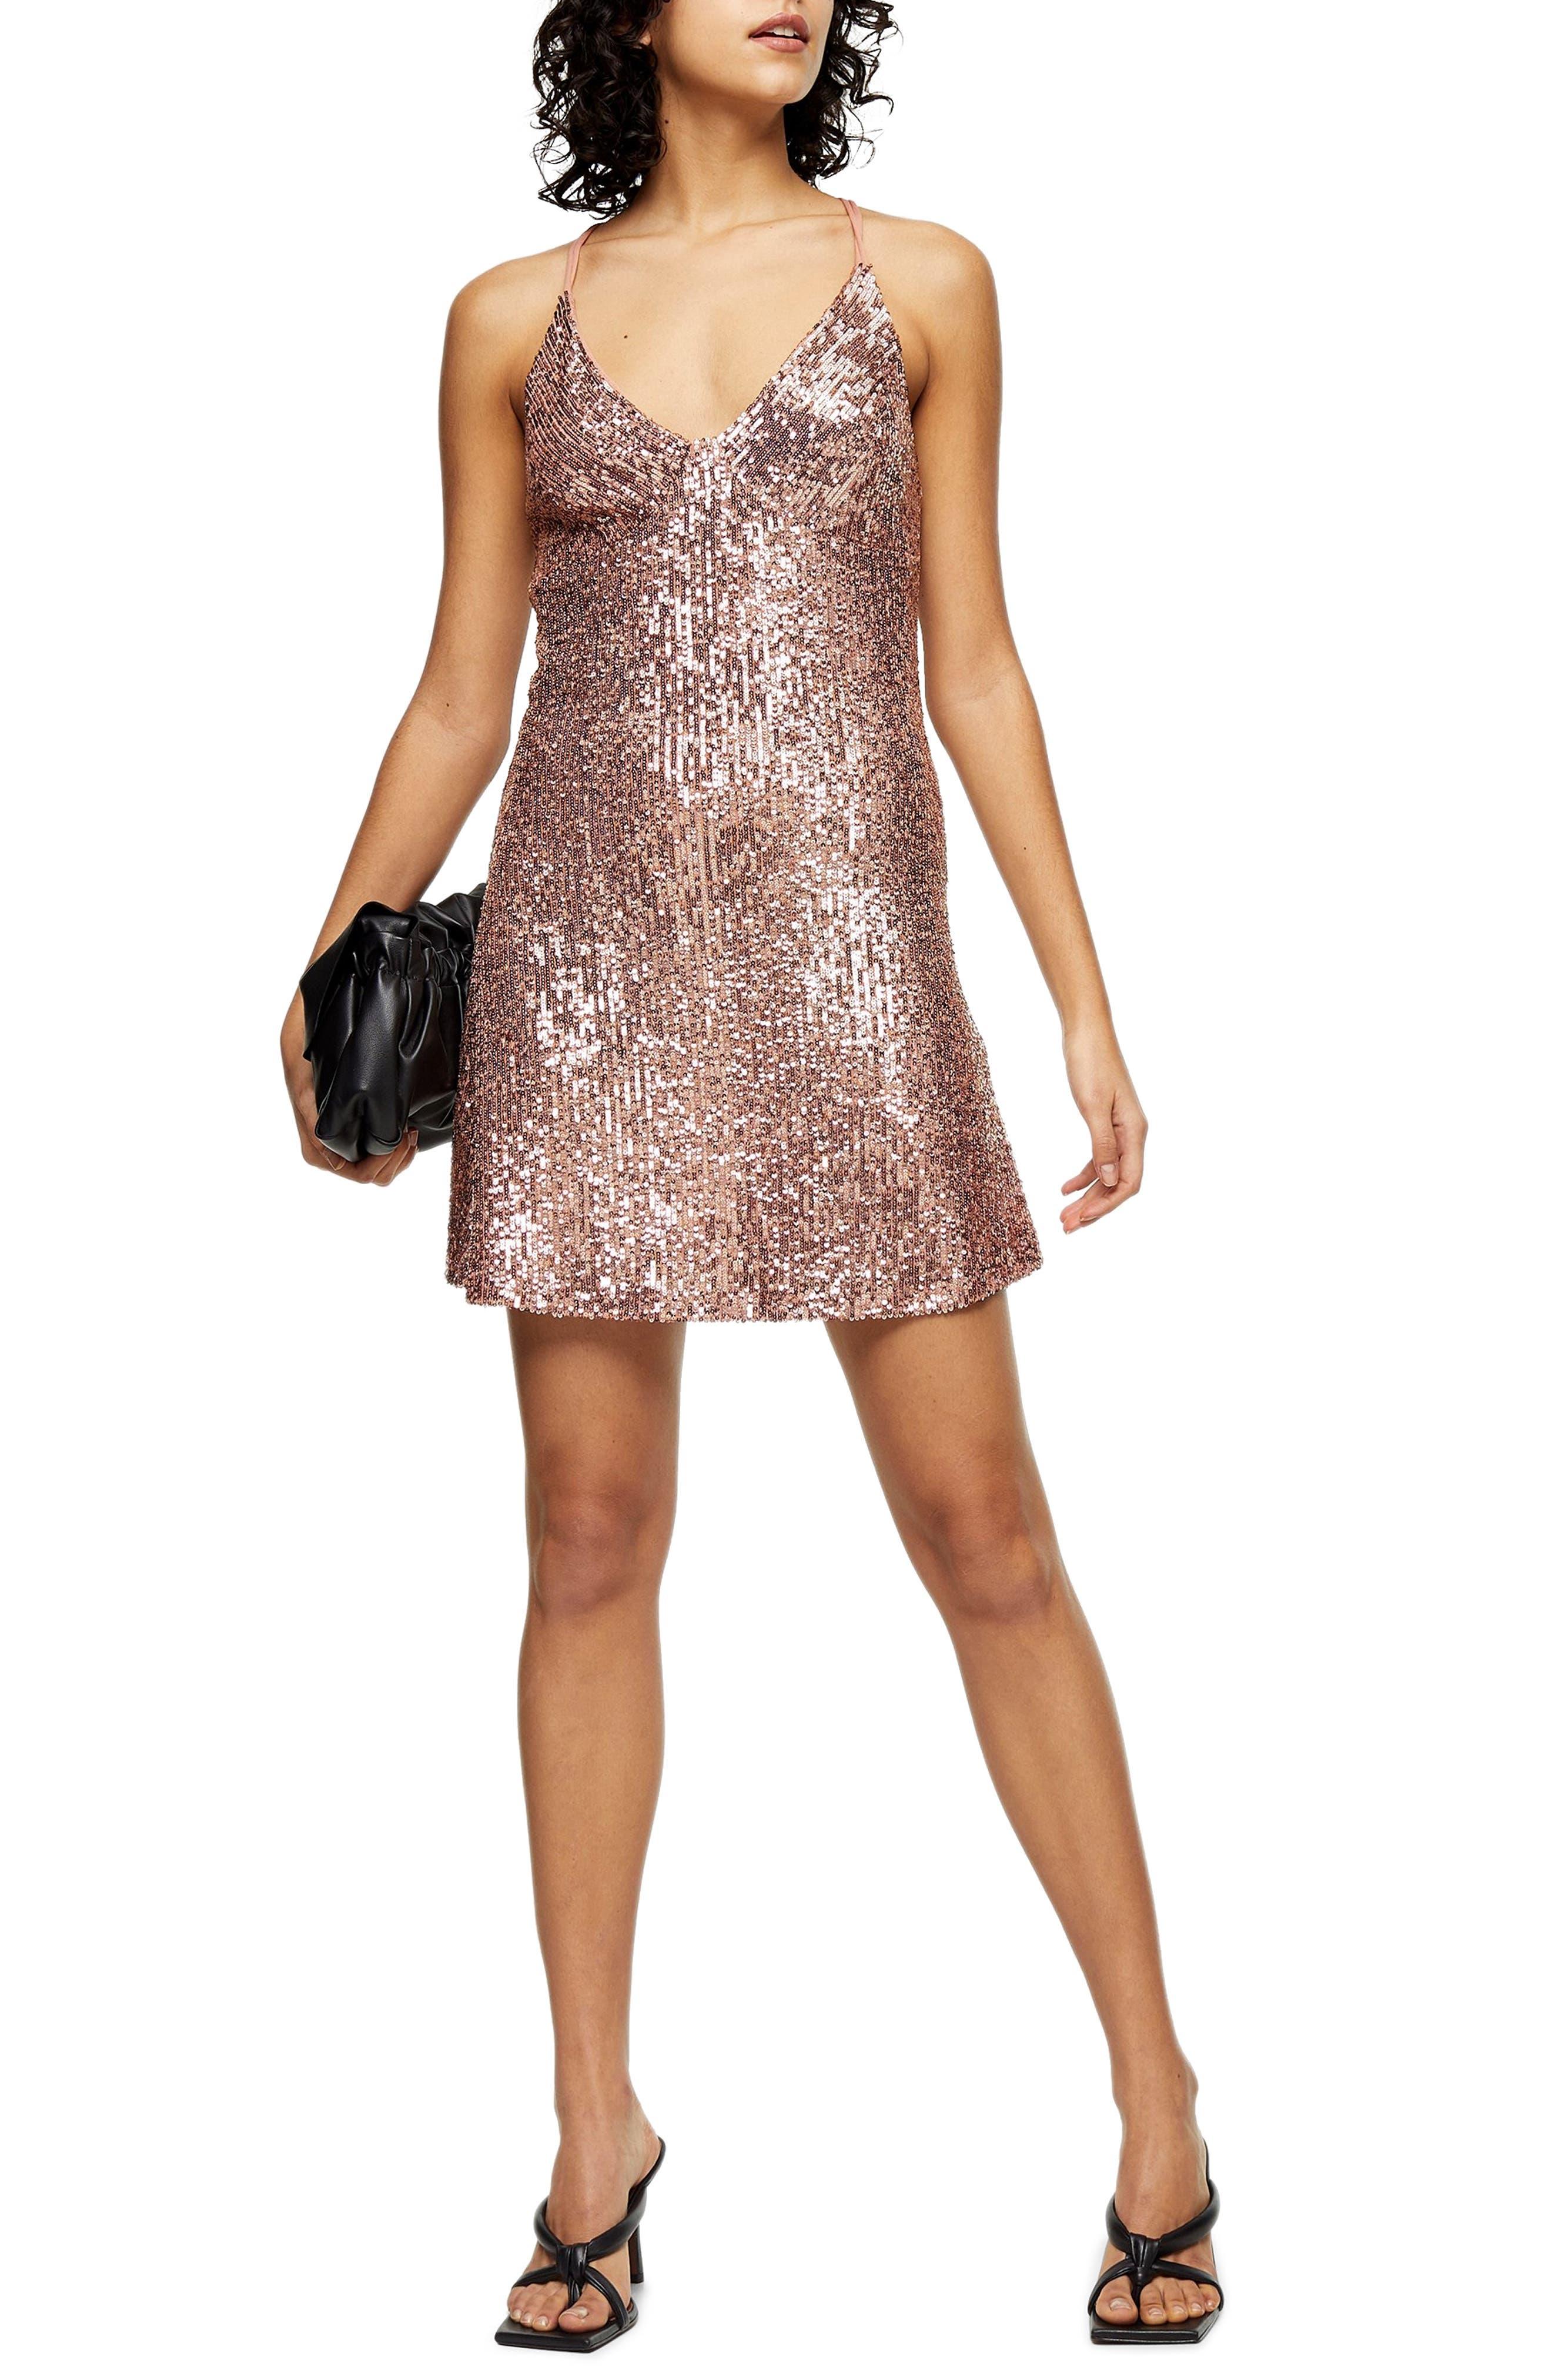 Image of TOPSHOP Sequin Open Back Minidress